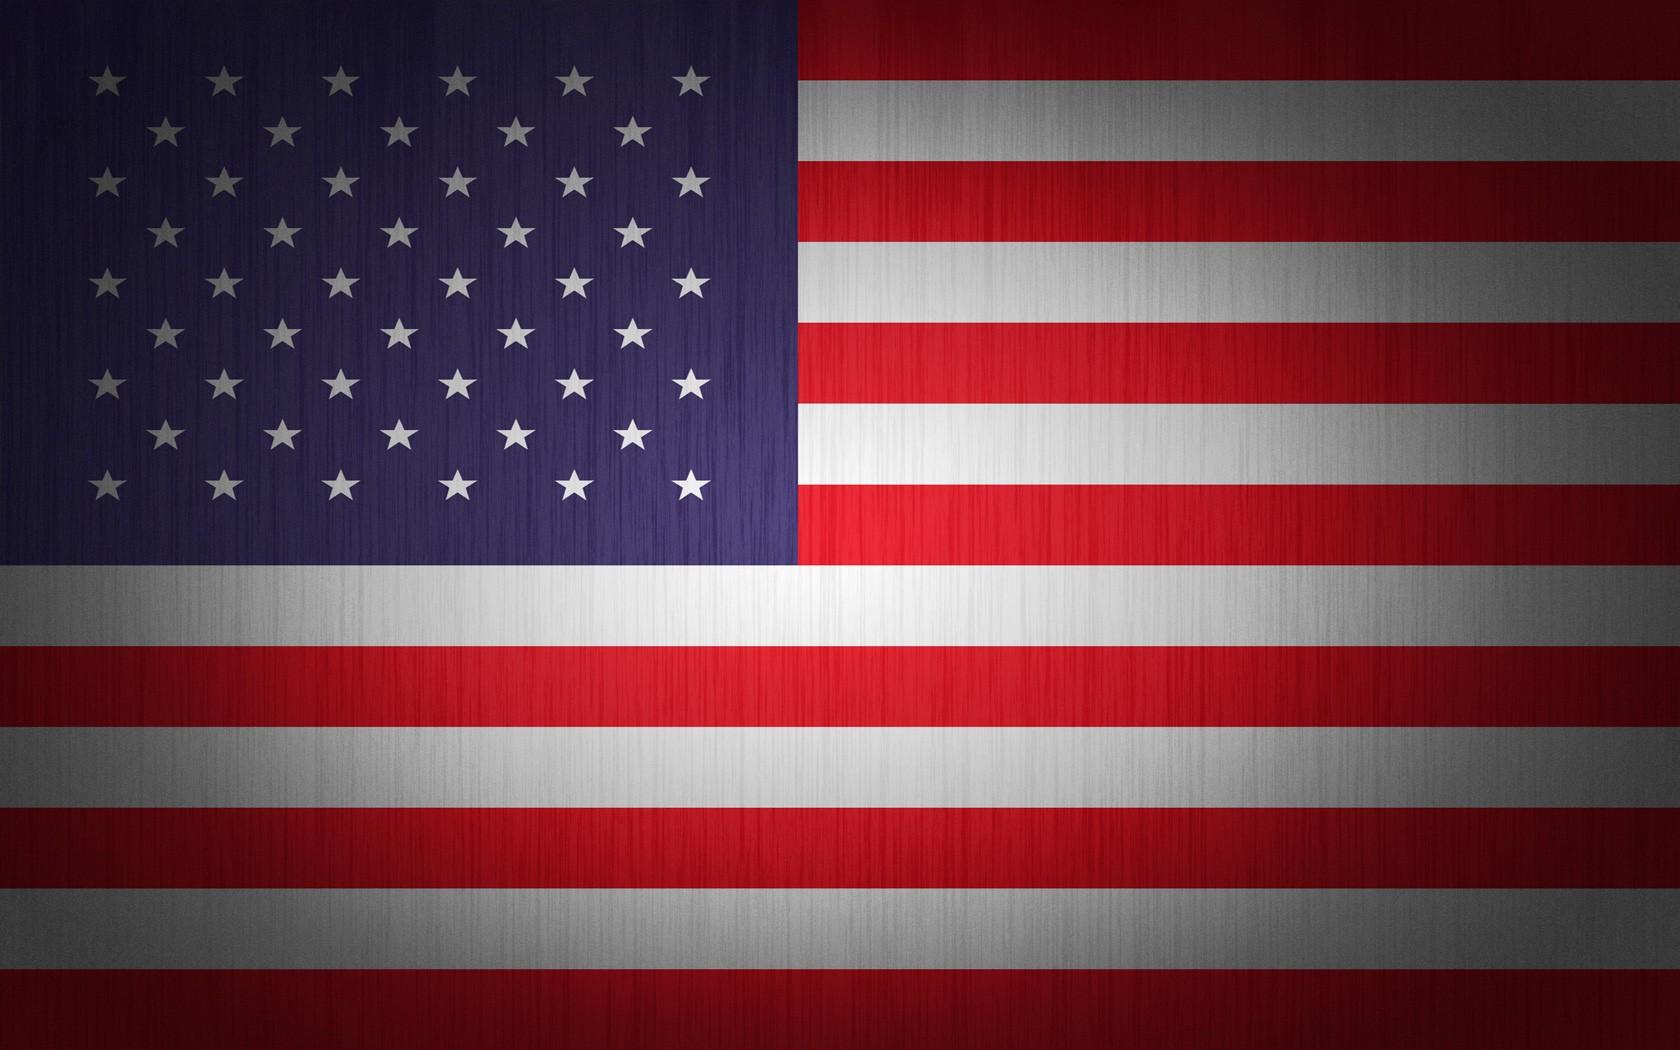 Flag Of Usa Wallpapers Hd Wallpapers Id 8653